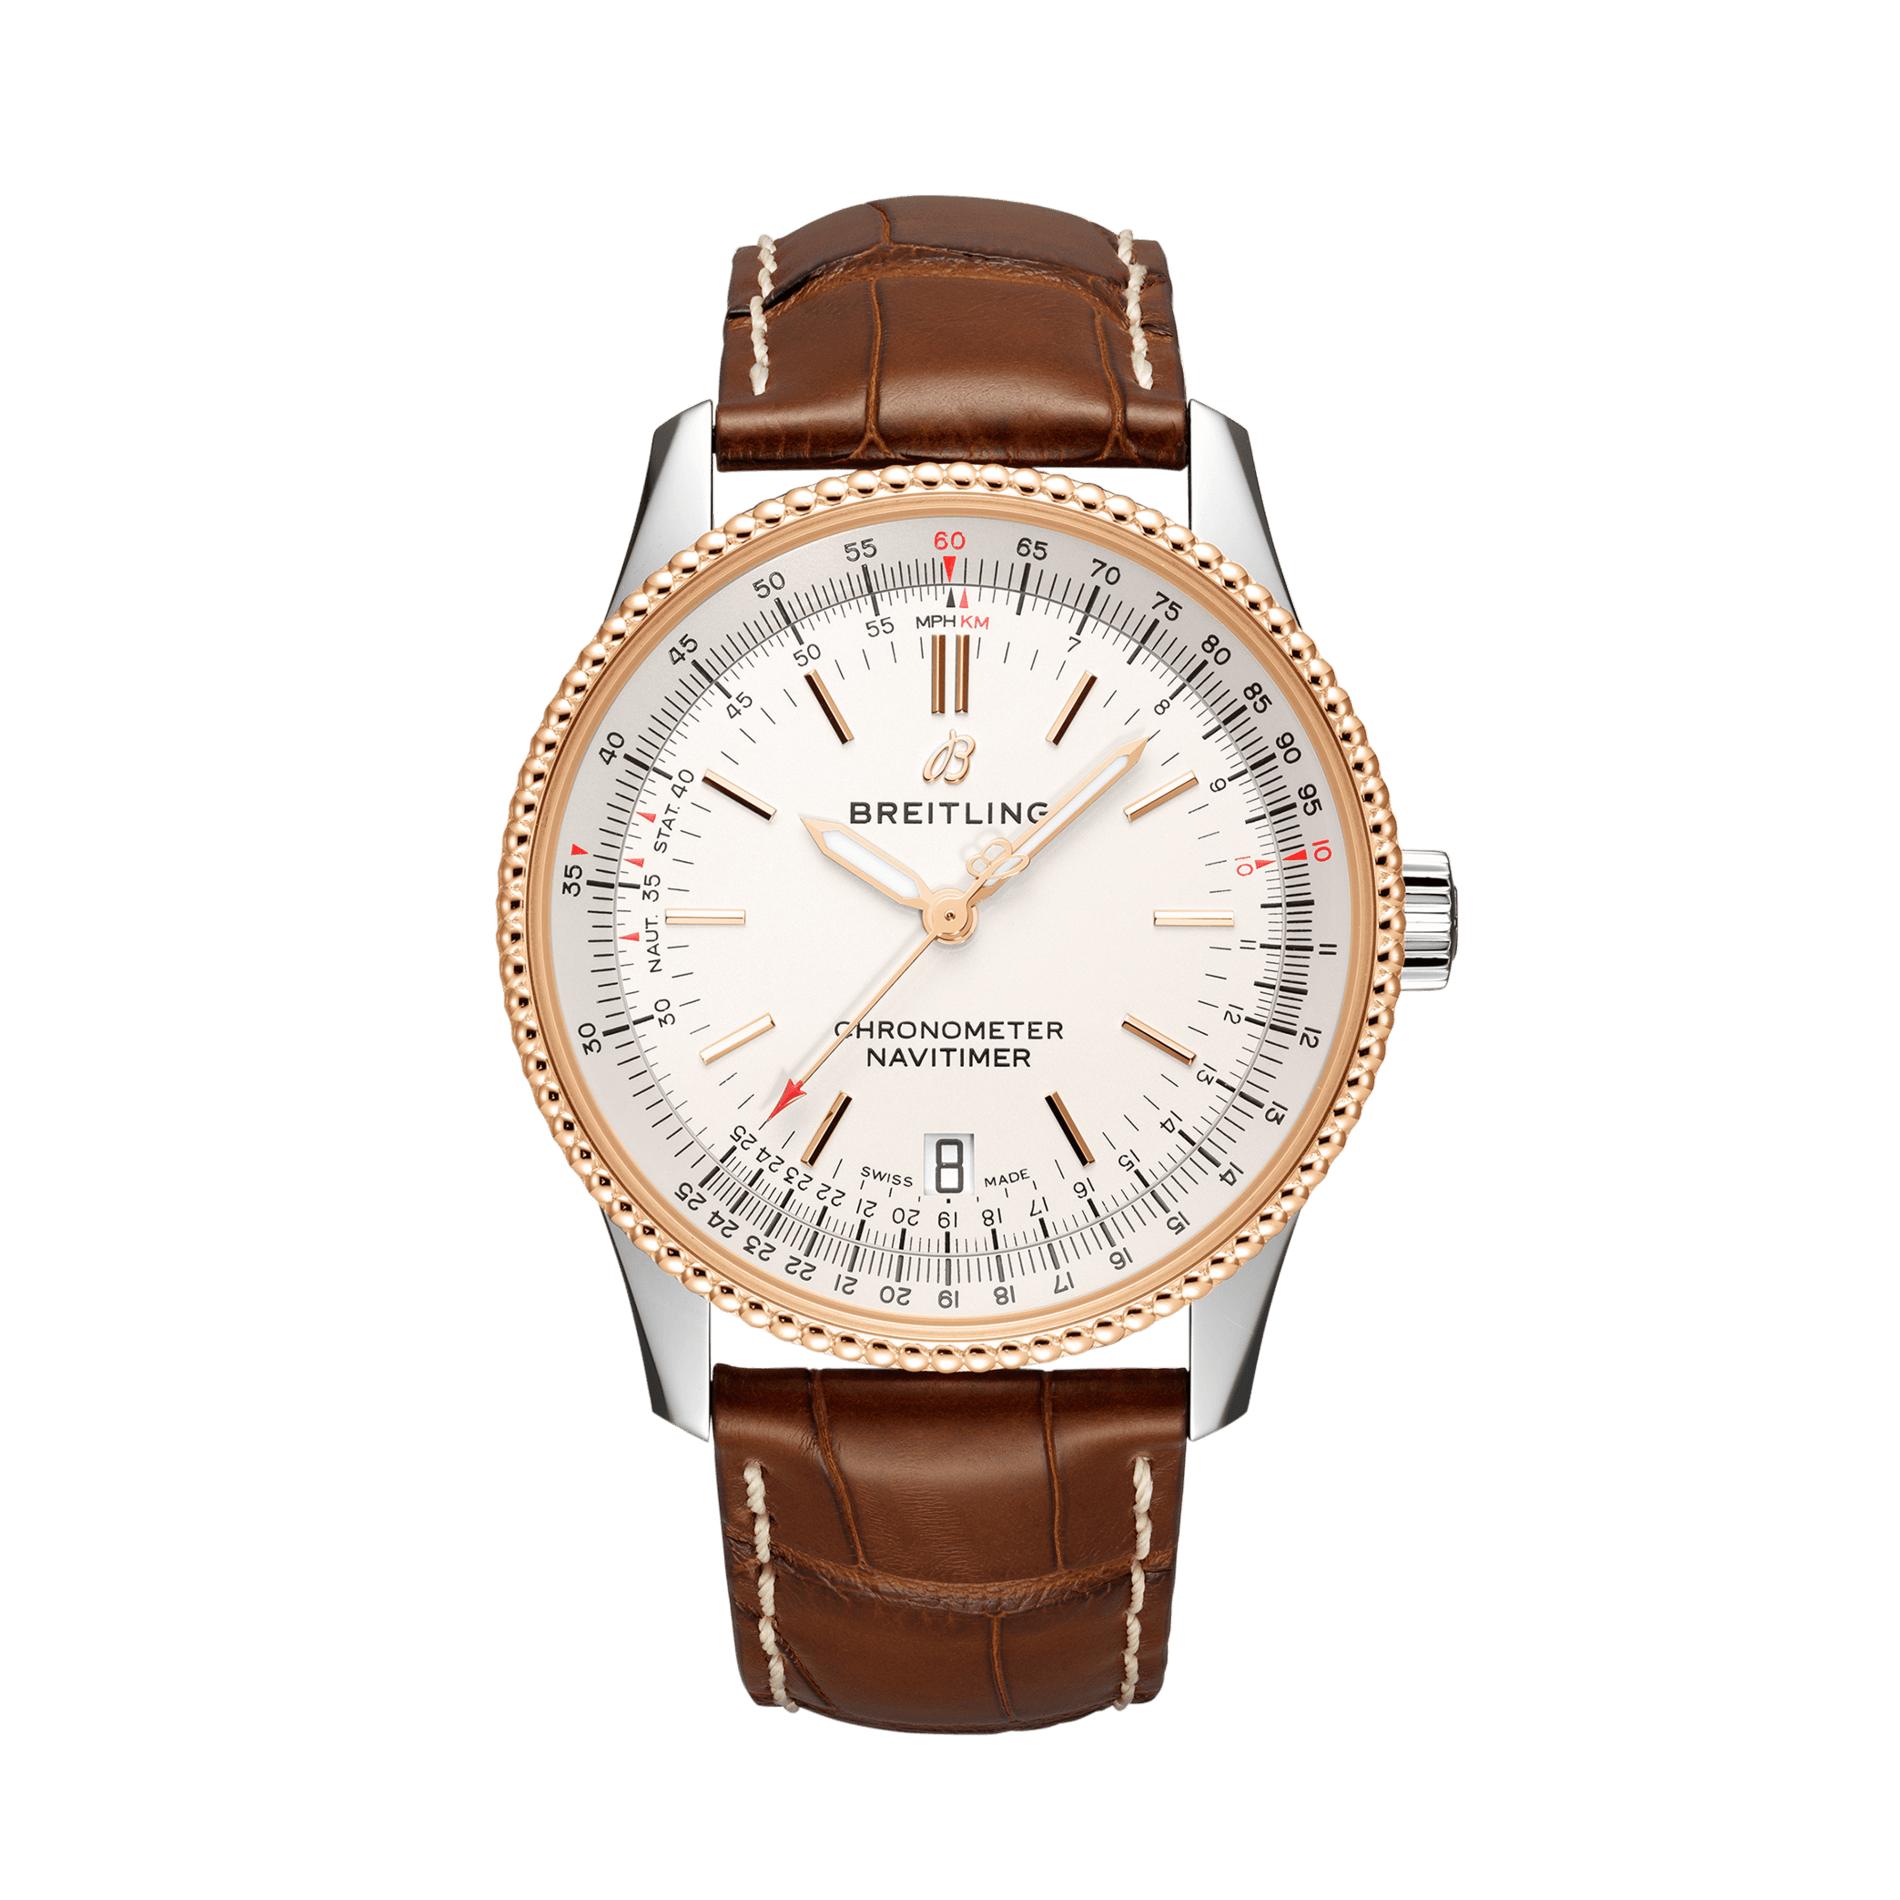 Reloj Breitling – Navitimer 8 Chronograph 43 - Amaya Joyeros